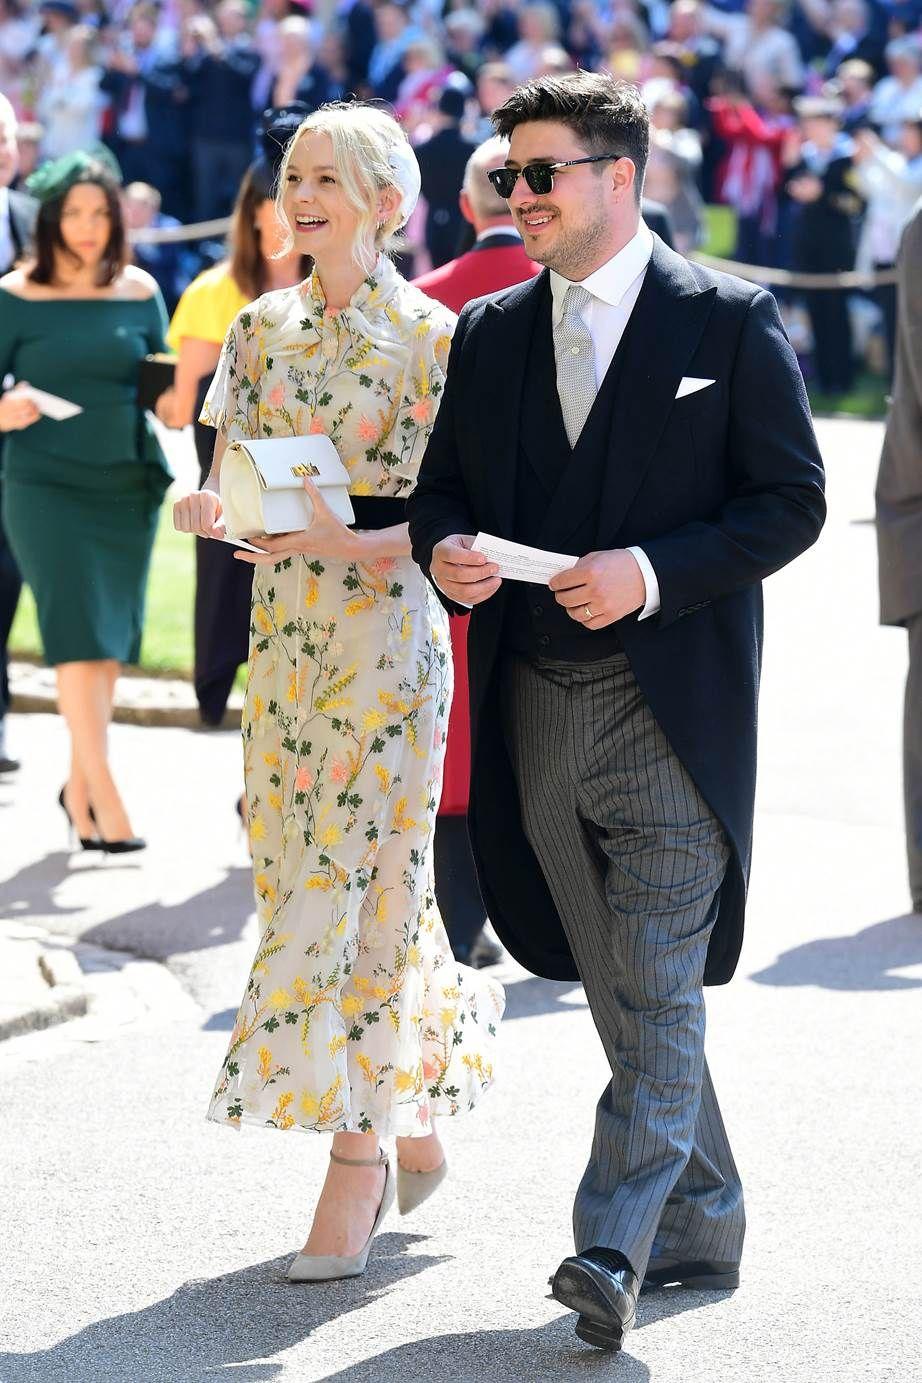 World Of Ladies World Of Ladies Royal Wedding Outfits Royal Wedding Guests Outfits Harry And Meghan Wedding